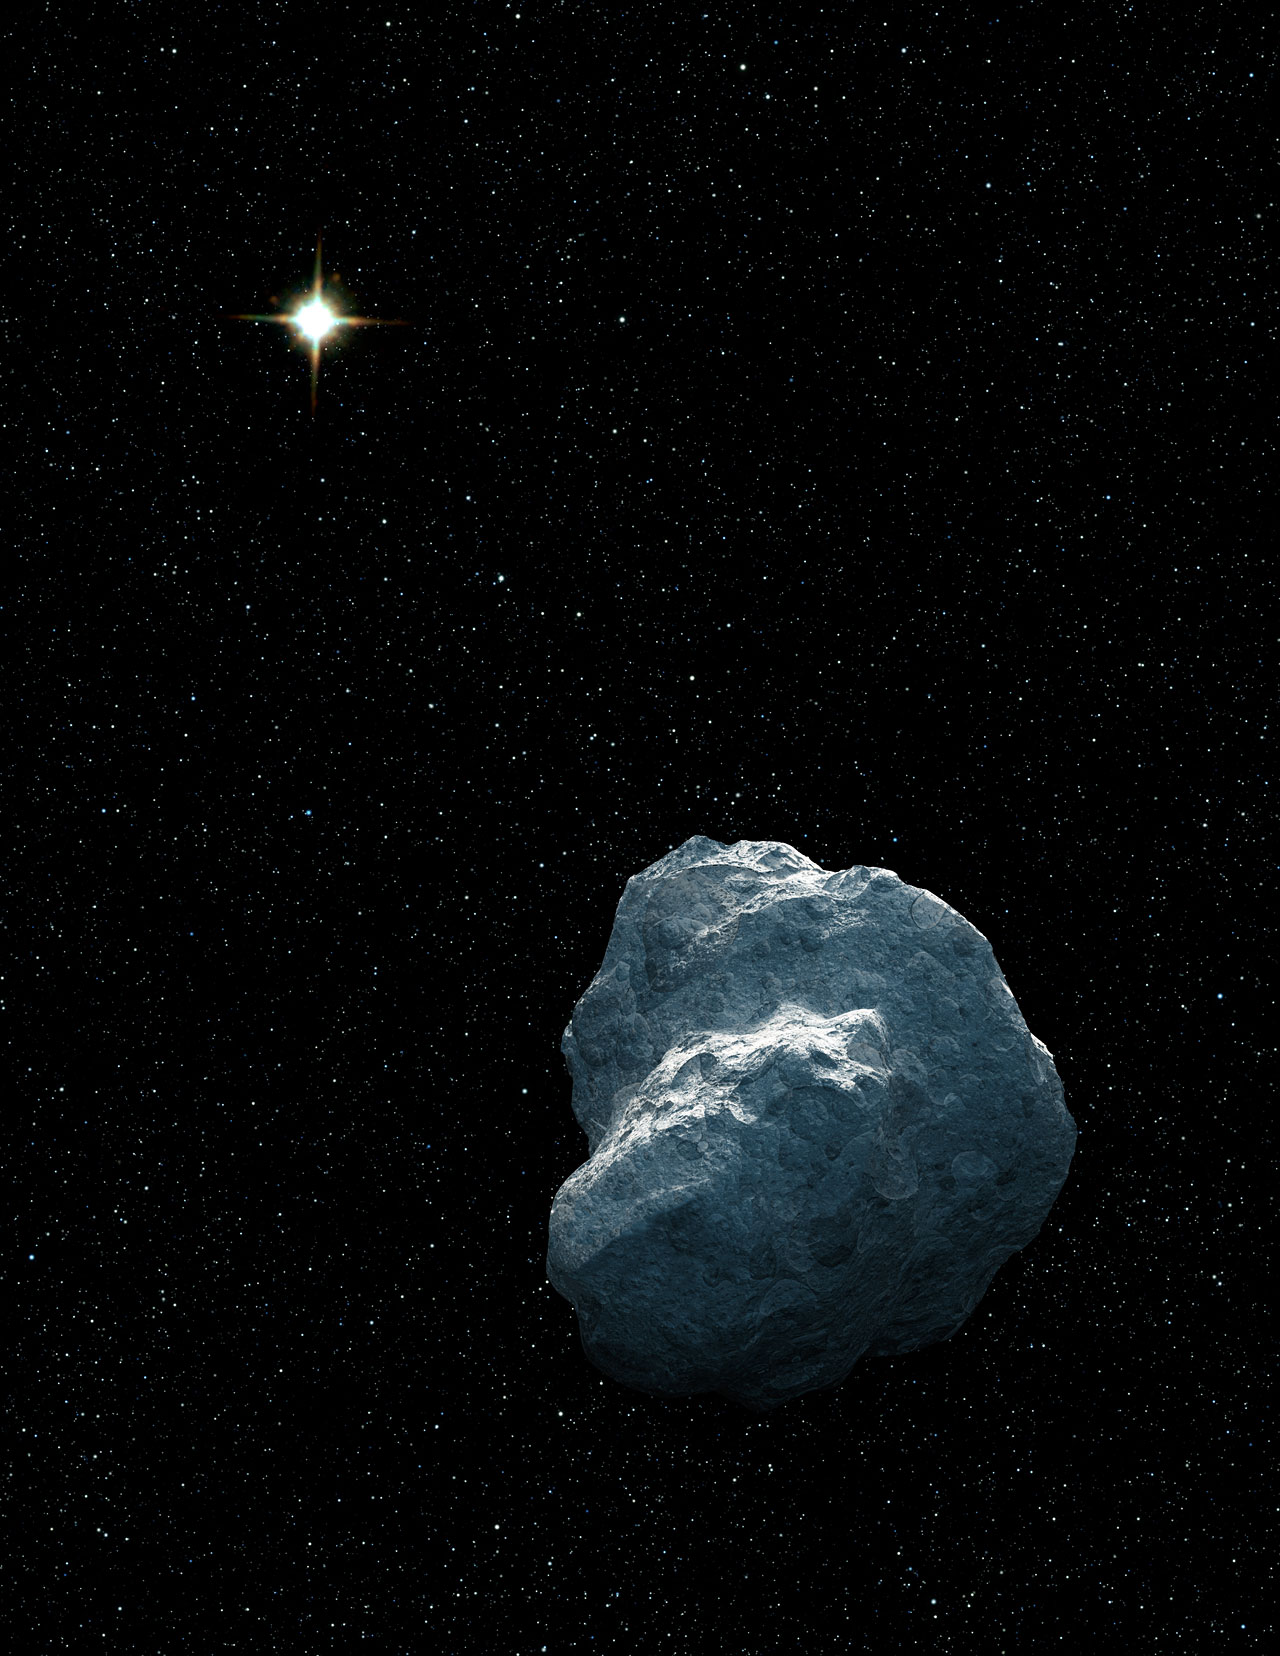 Trans-Neptunian Object (artist's impression)